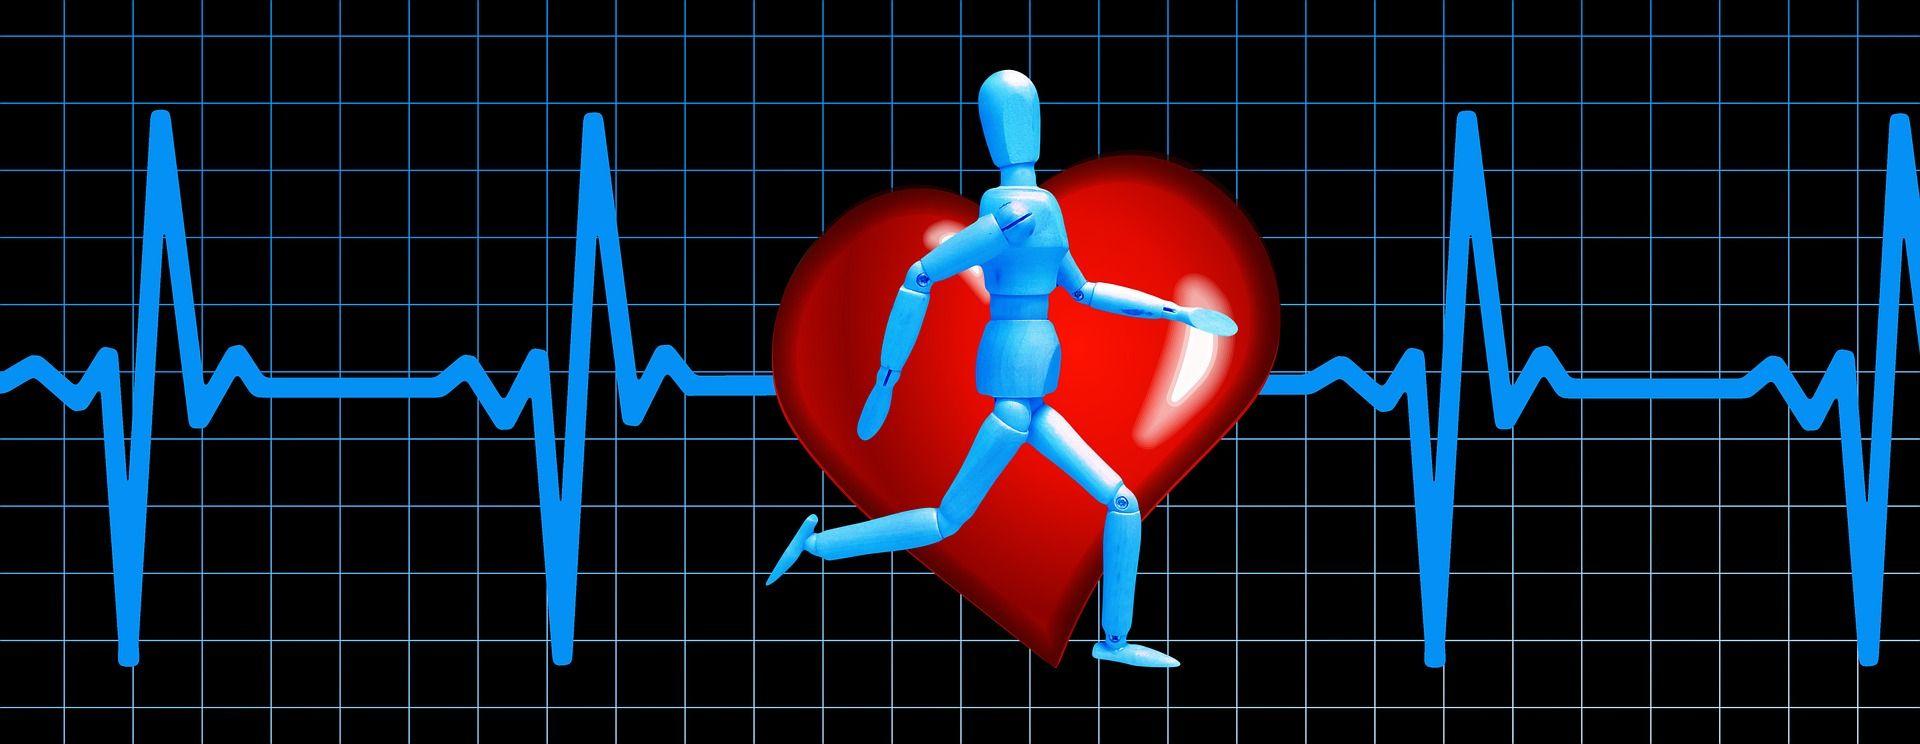 Termine | Herzsport-Vreden e.V.